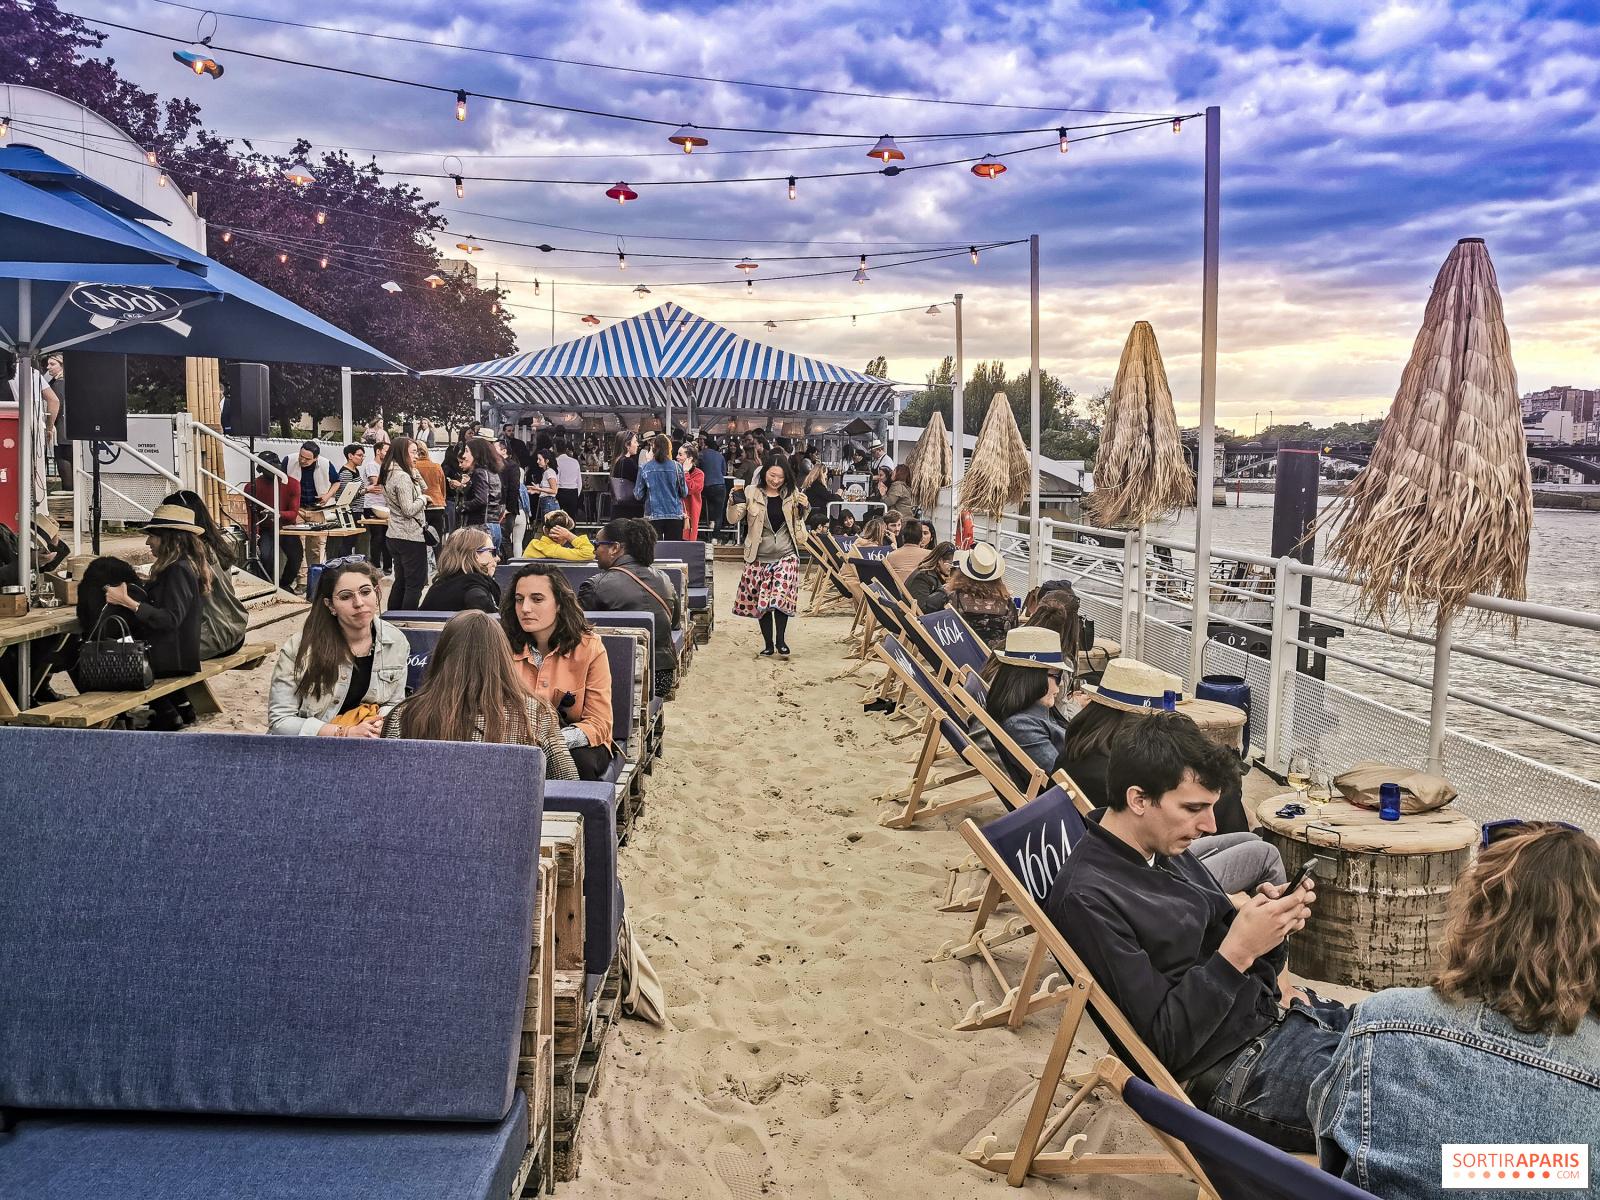 Terrasse Canal Saint Martin polpo plage: the sand-set terrace in paris - sortiraparis